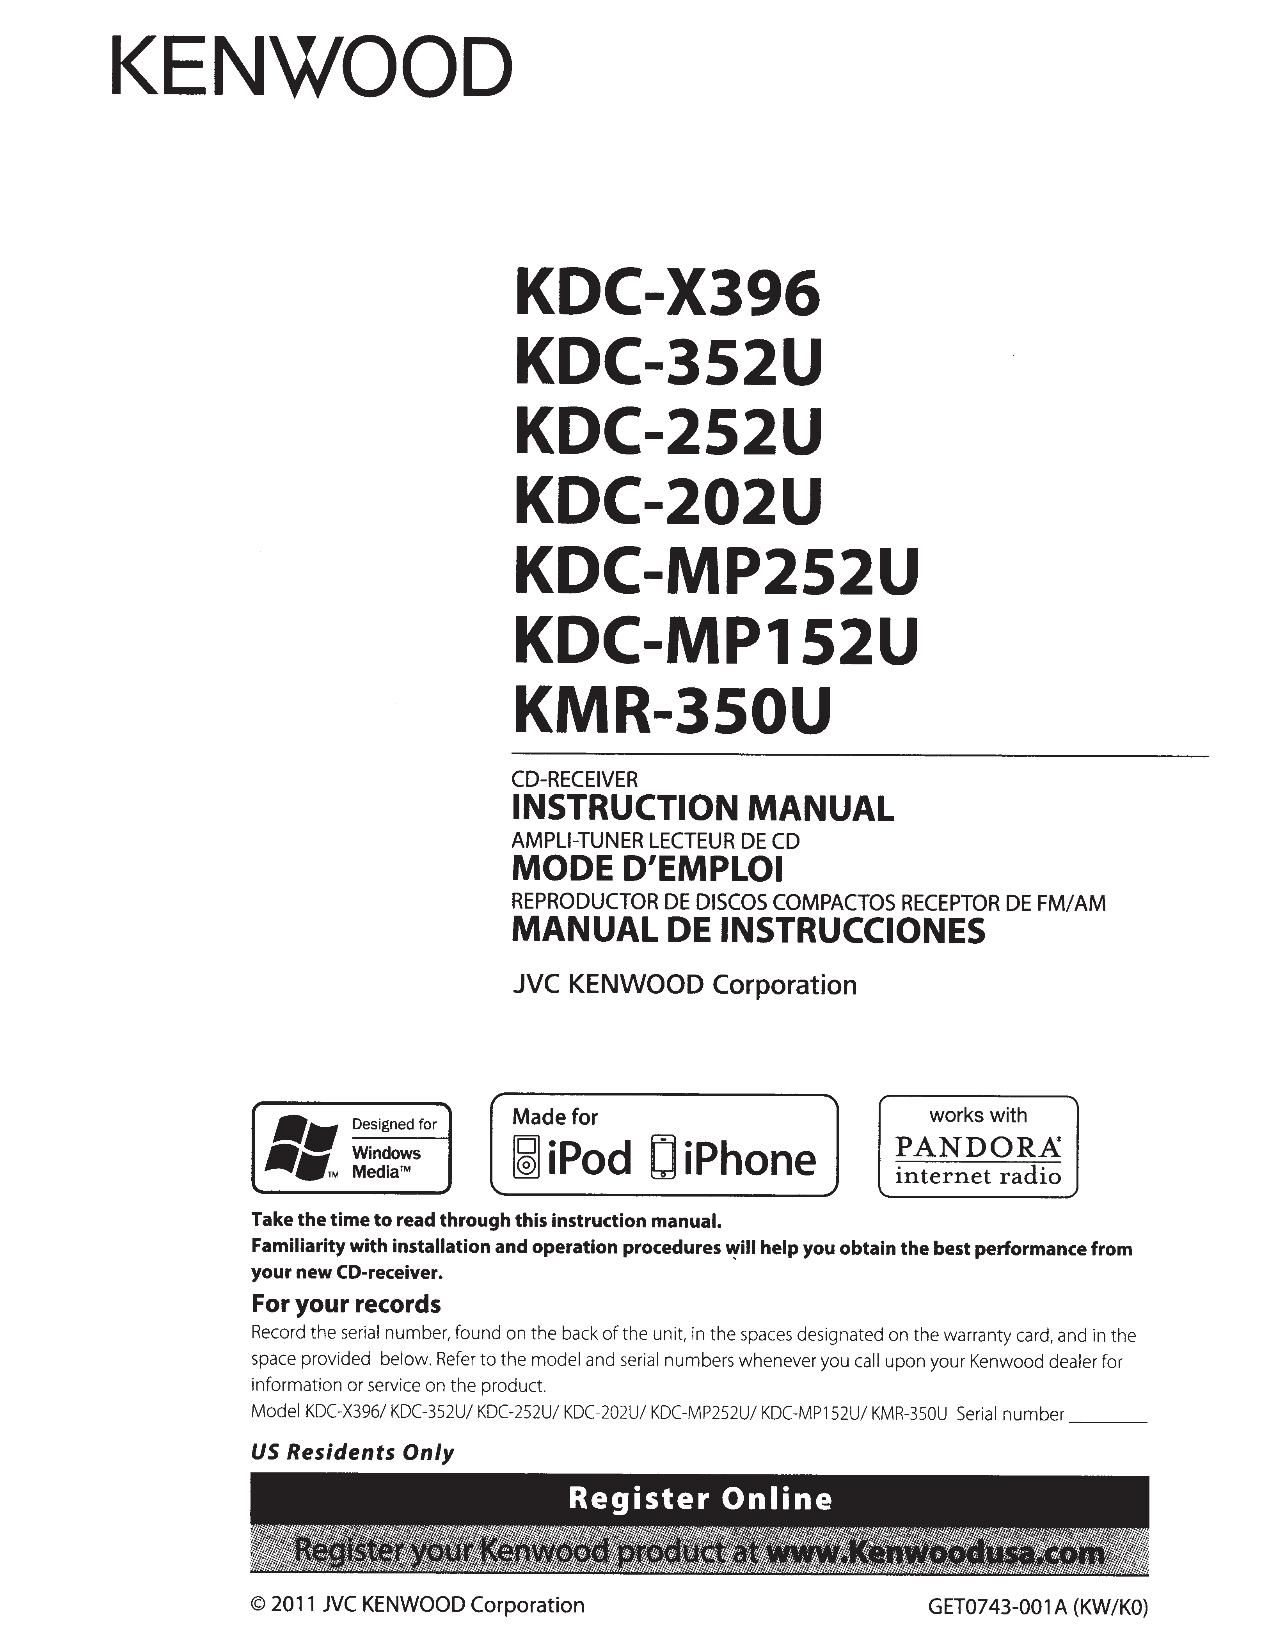 Kenwood Kdc Mp342U Wiring Diagram from wiringall.com